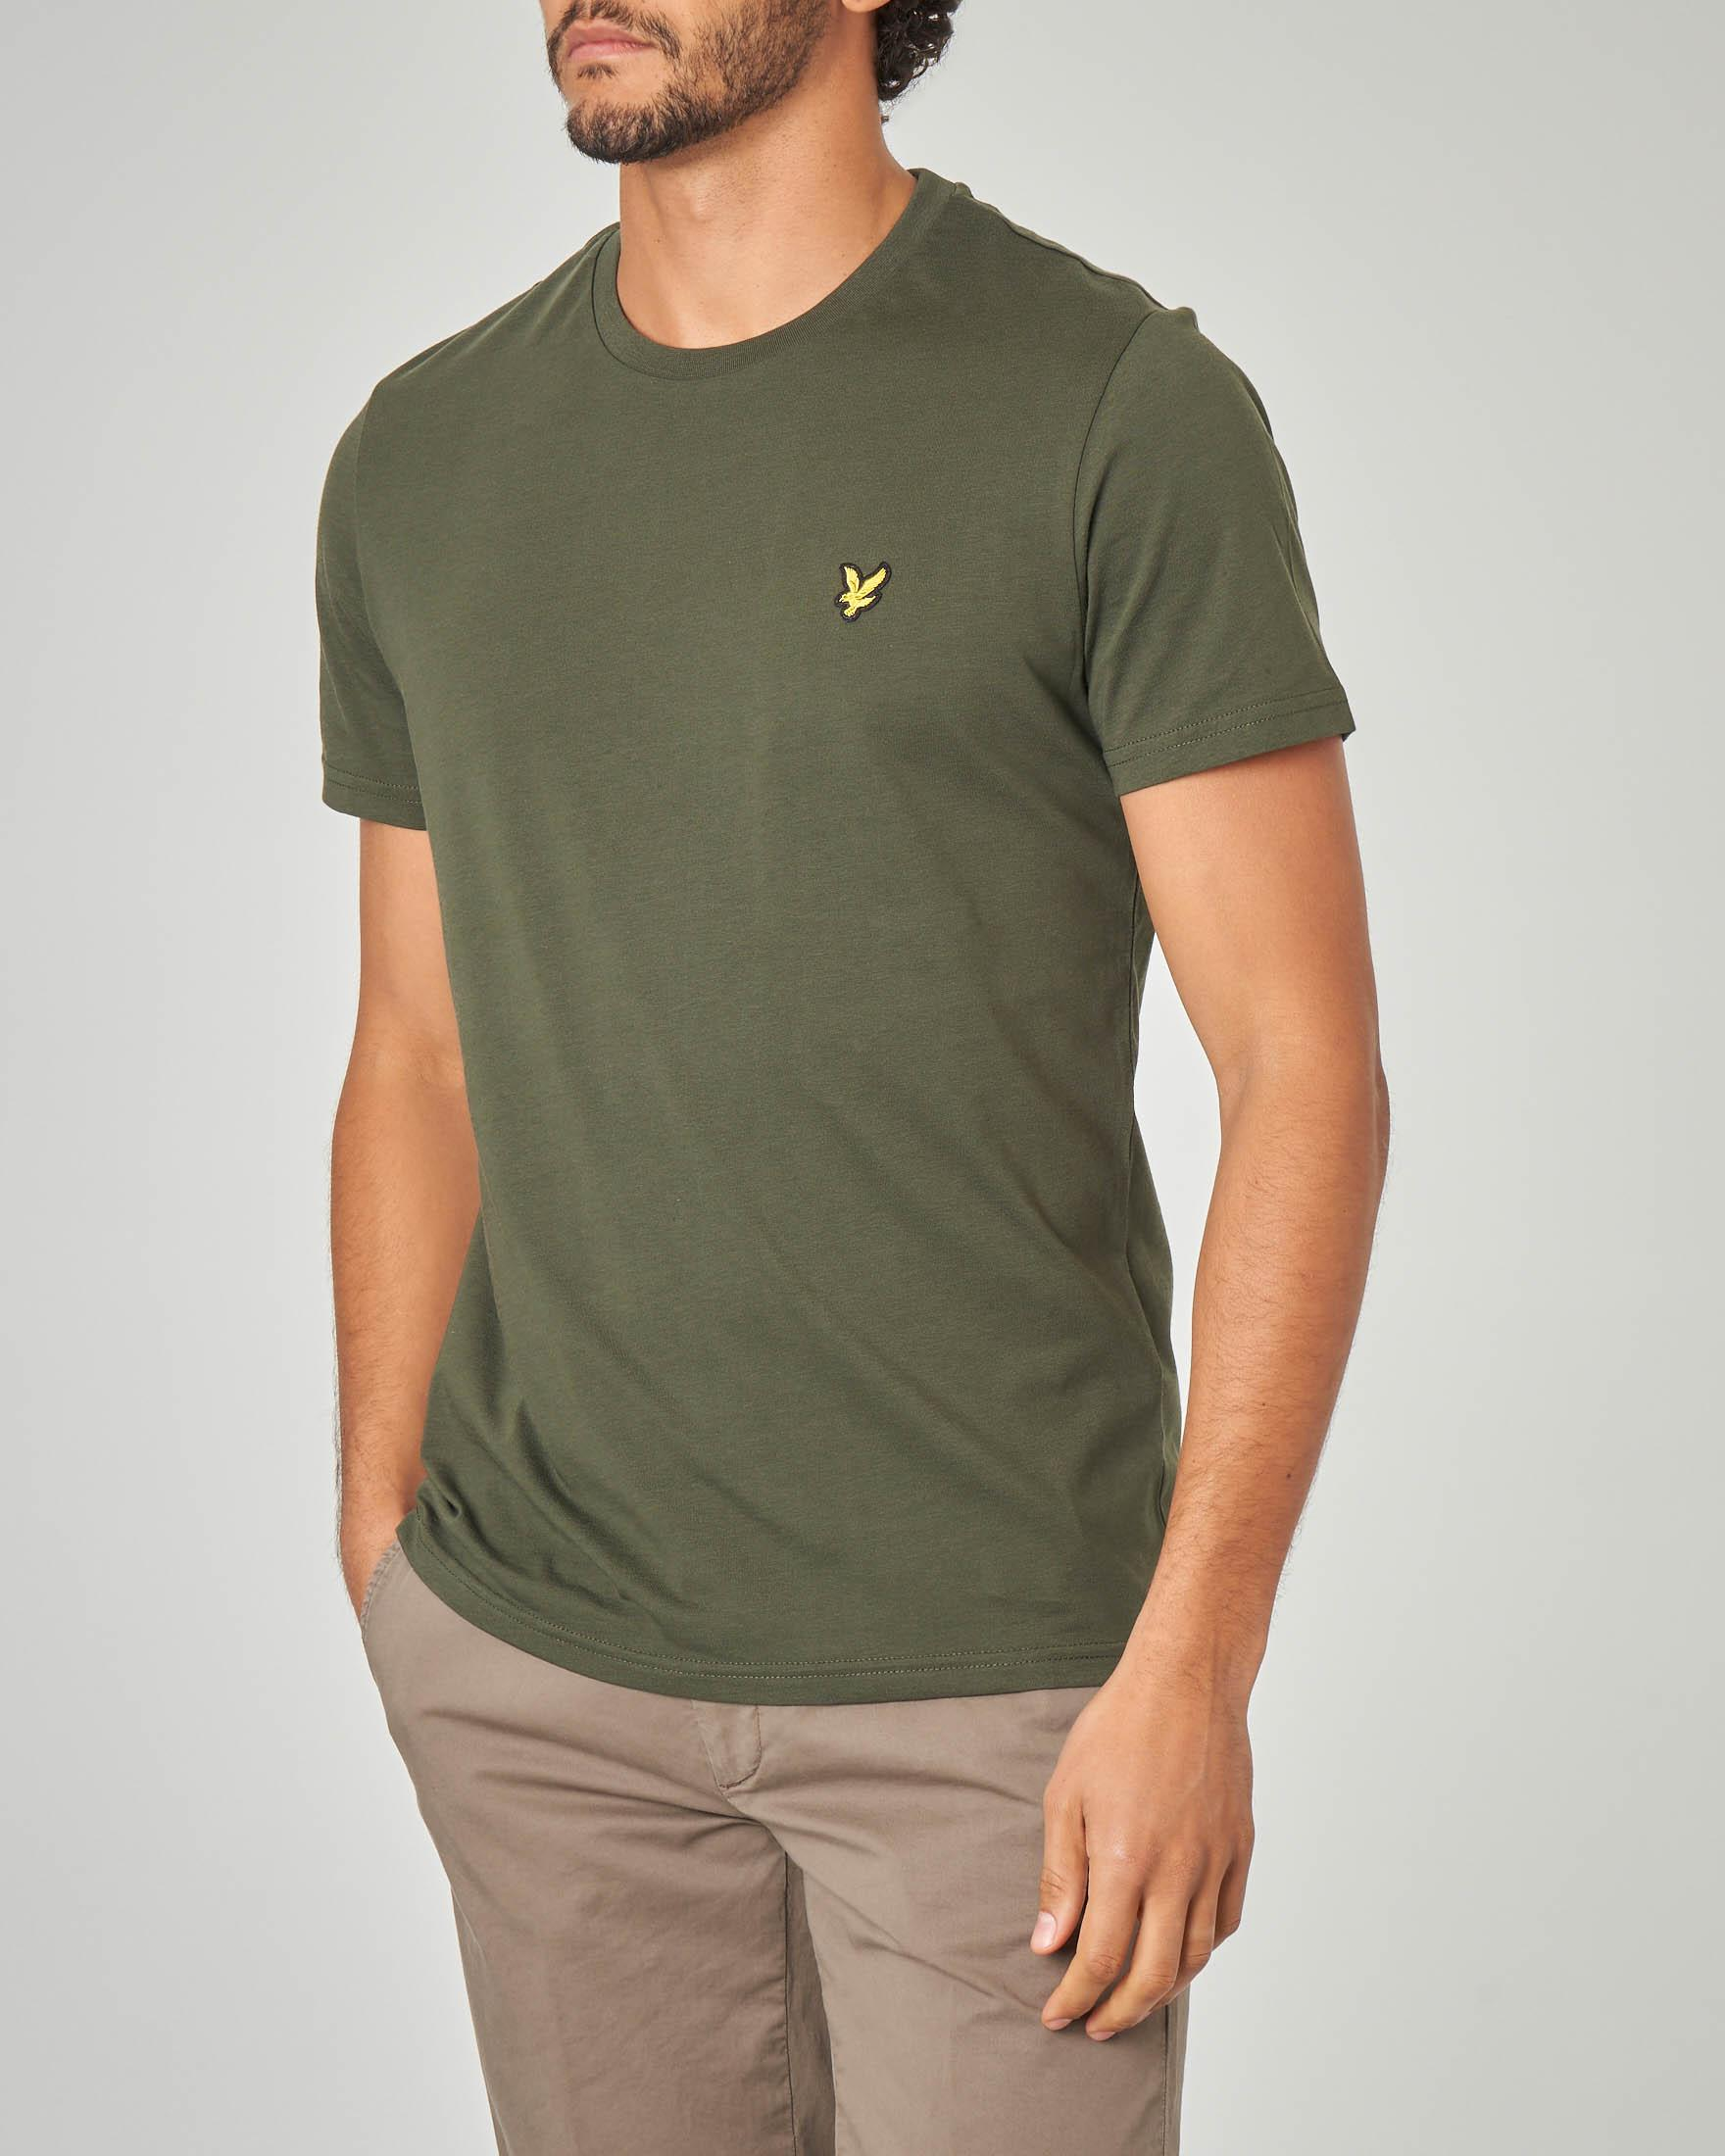 T-shirt verde militare tinta unita